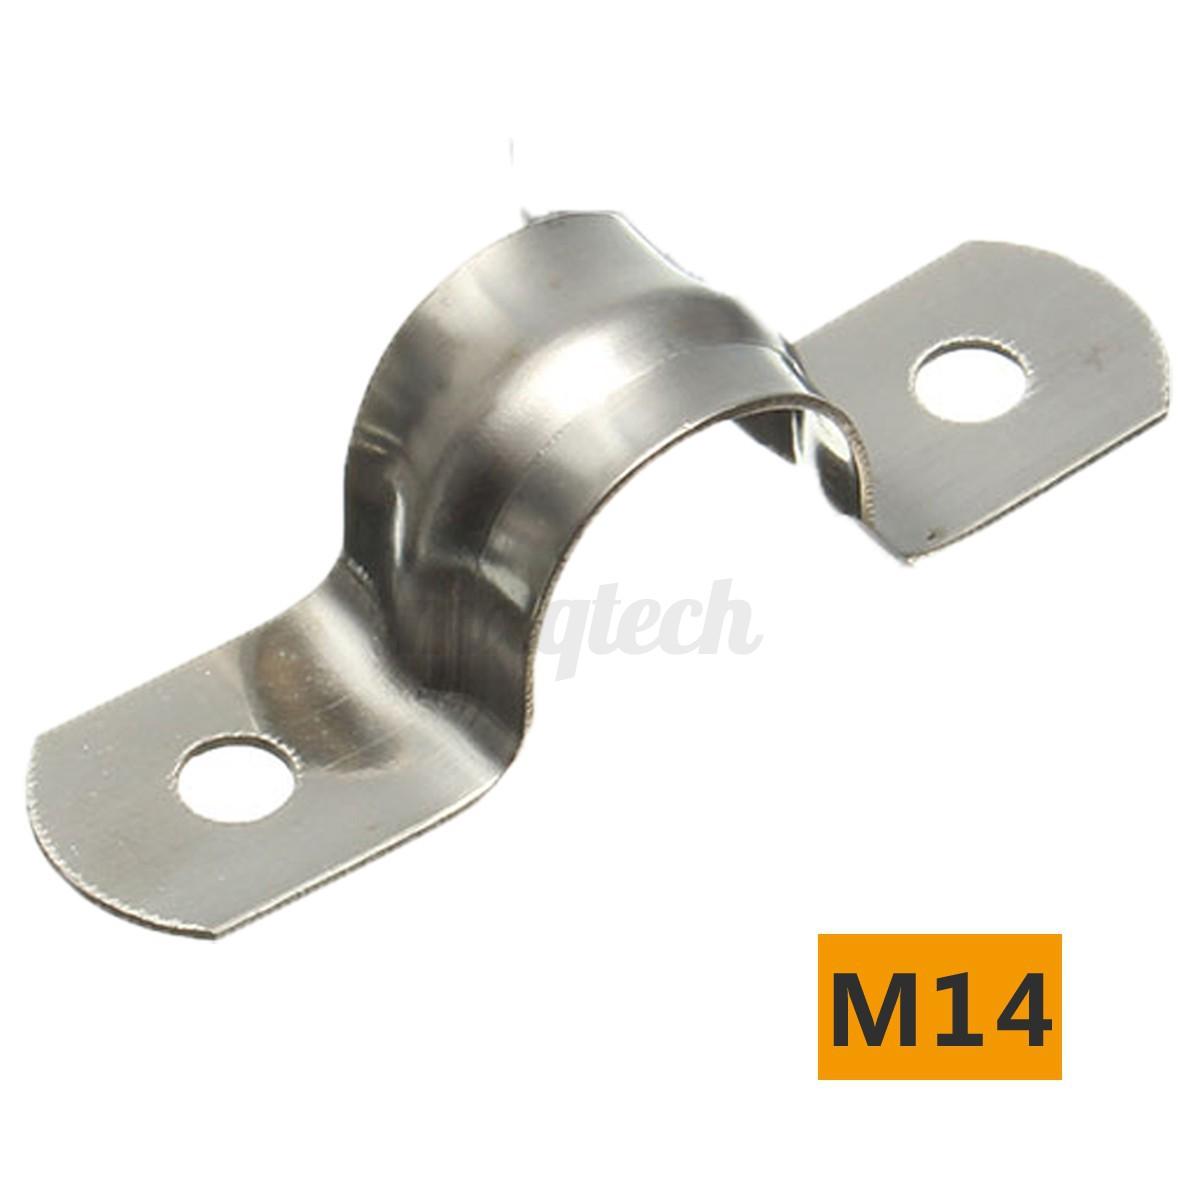 Pcs stainless steel plumbing fitting pipe saddle